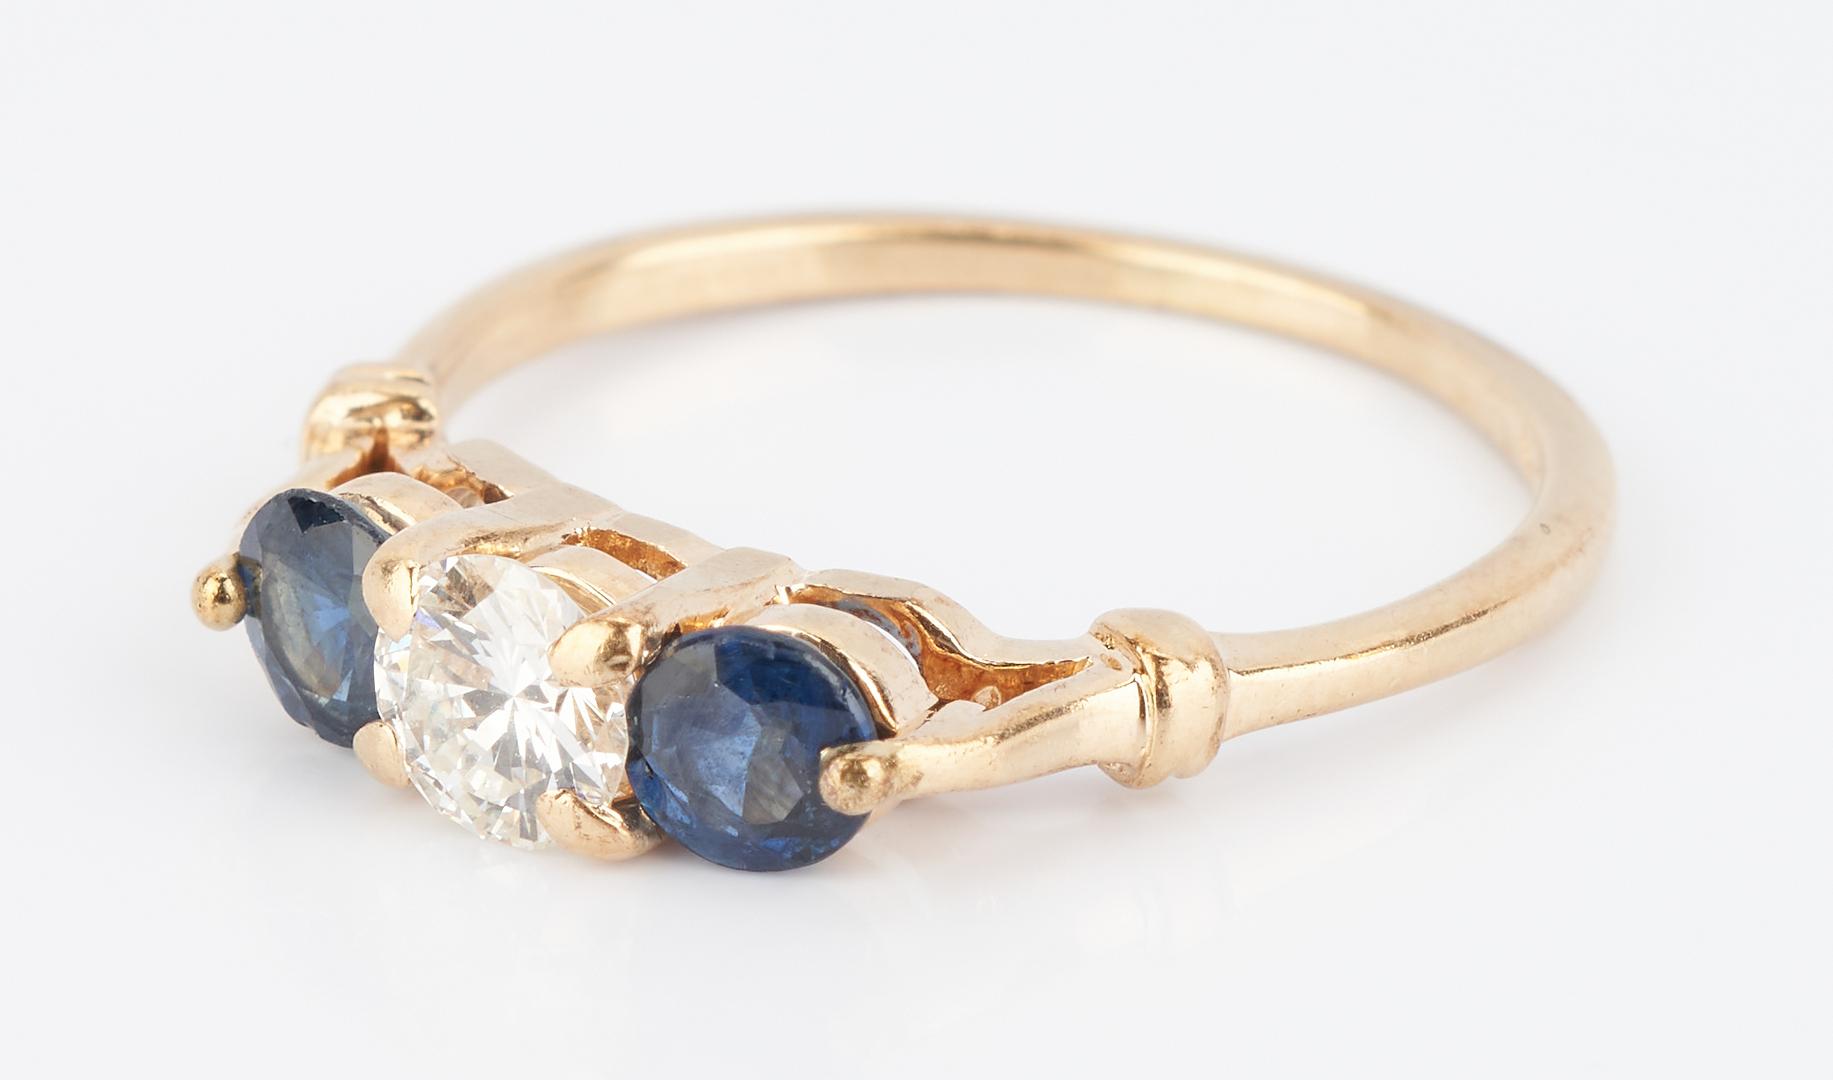 Lot 505: 2 Ladies Egg Pendants and Diamond & Sapphire Ring, 3 items